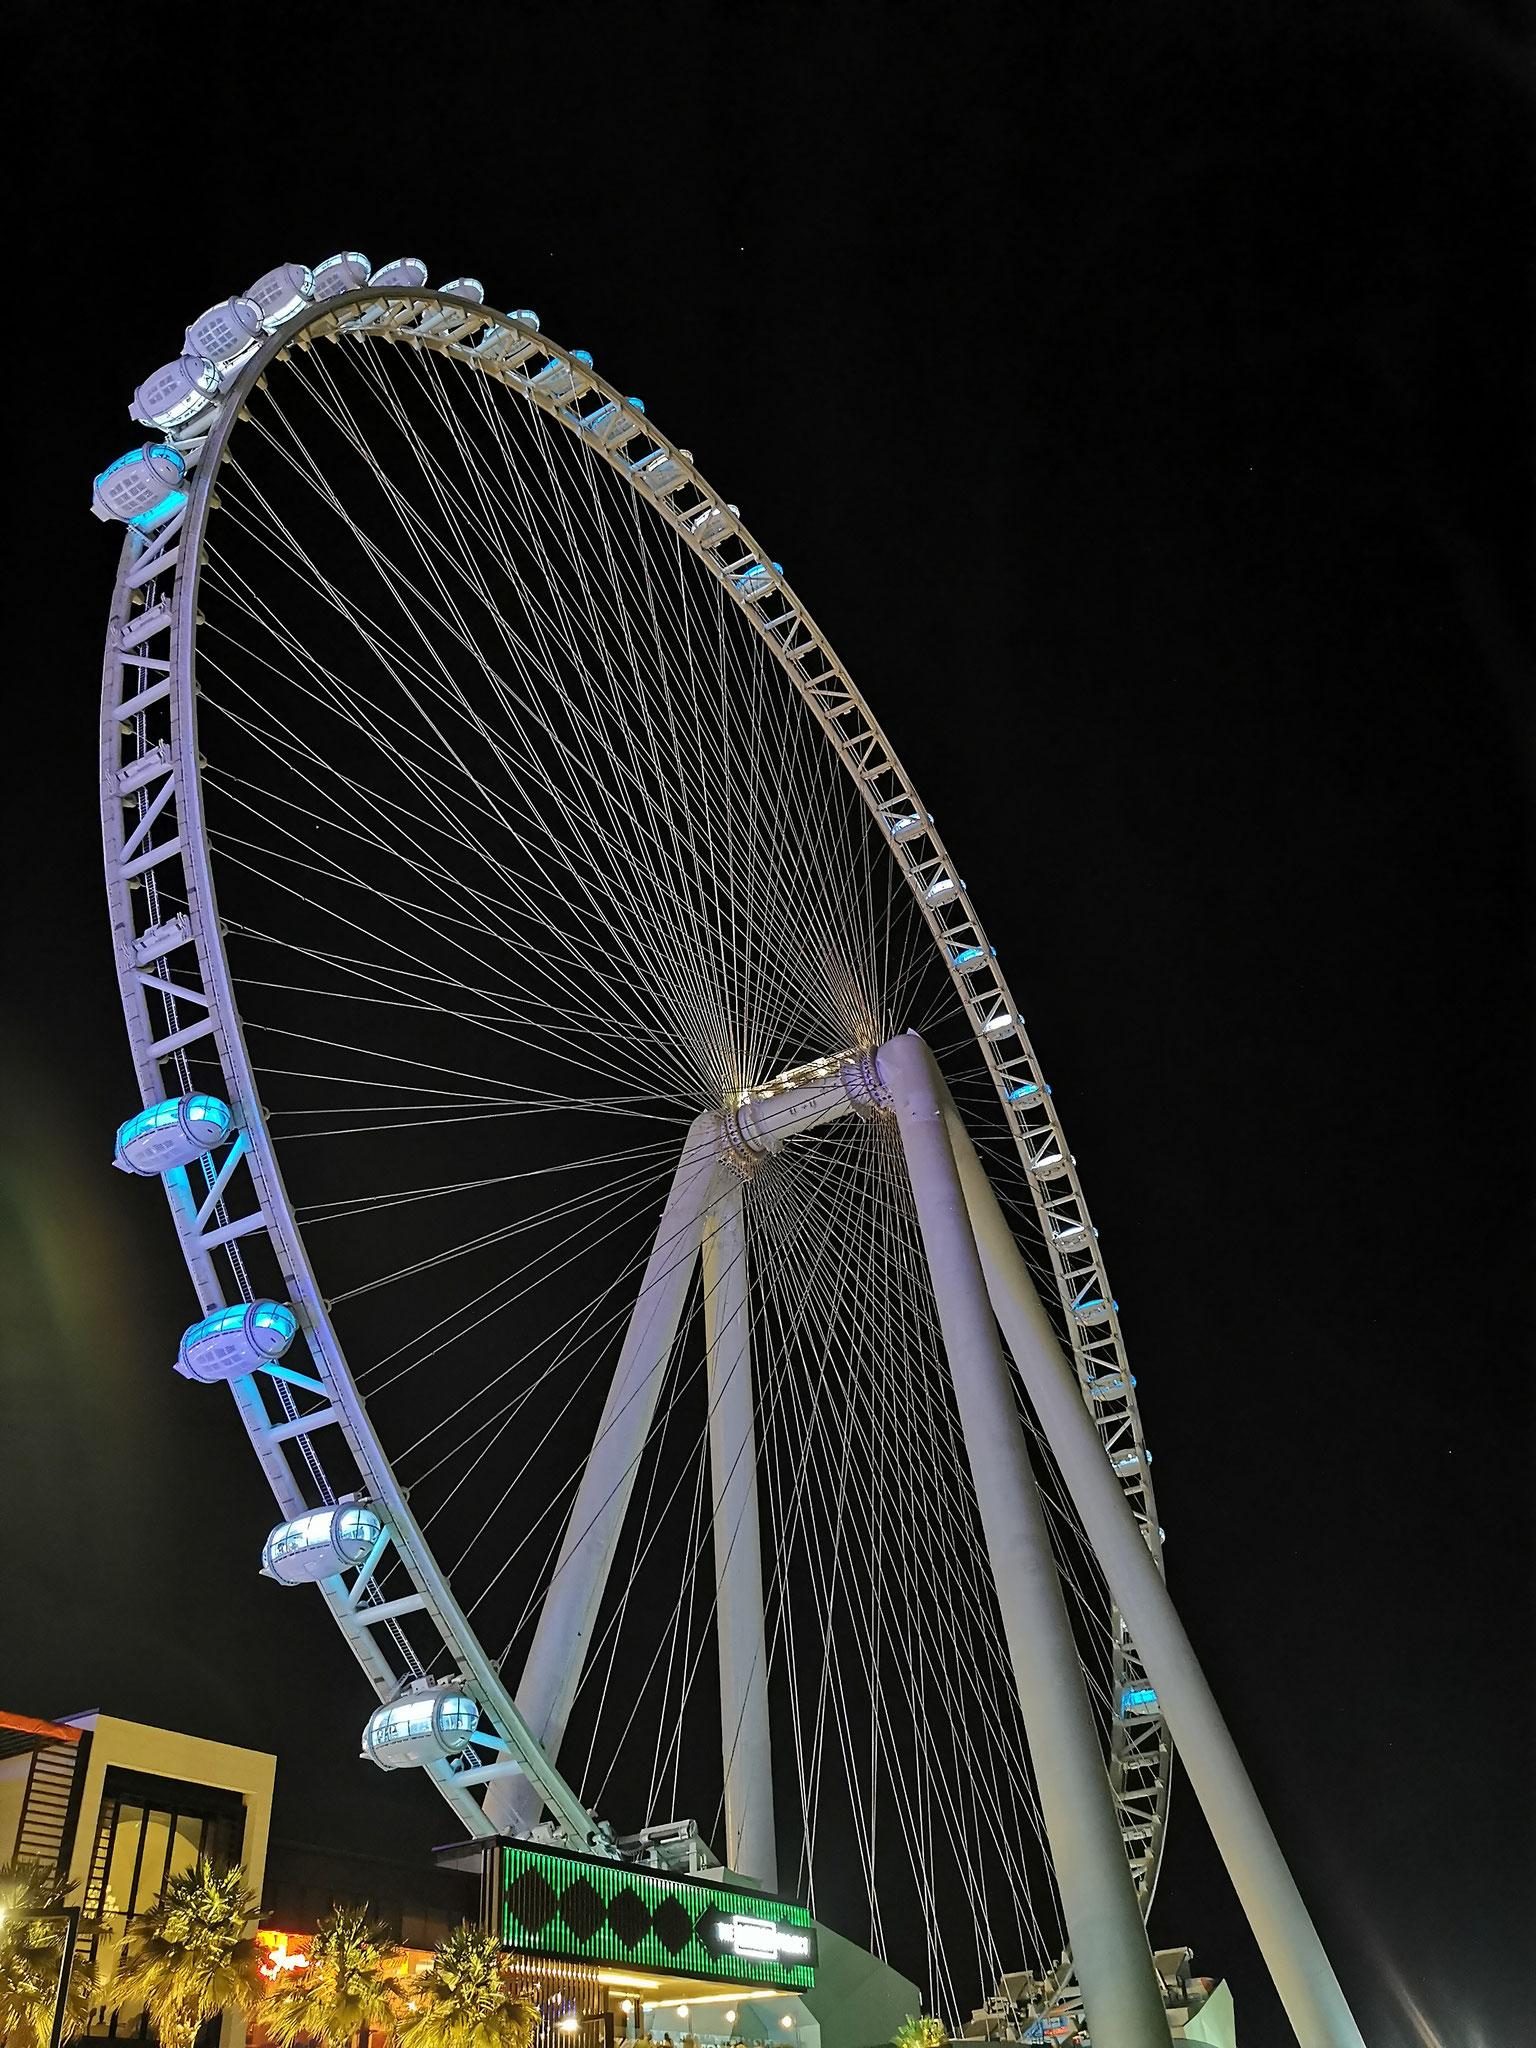 Das größte Riesenrad der Welt - Ain Dubai